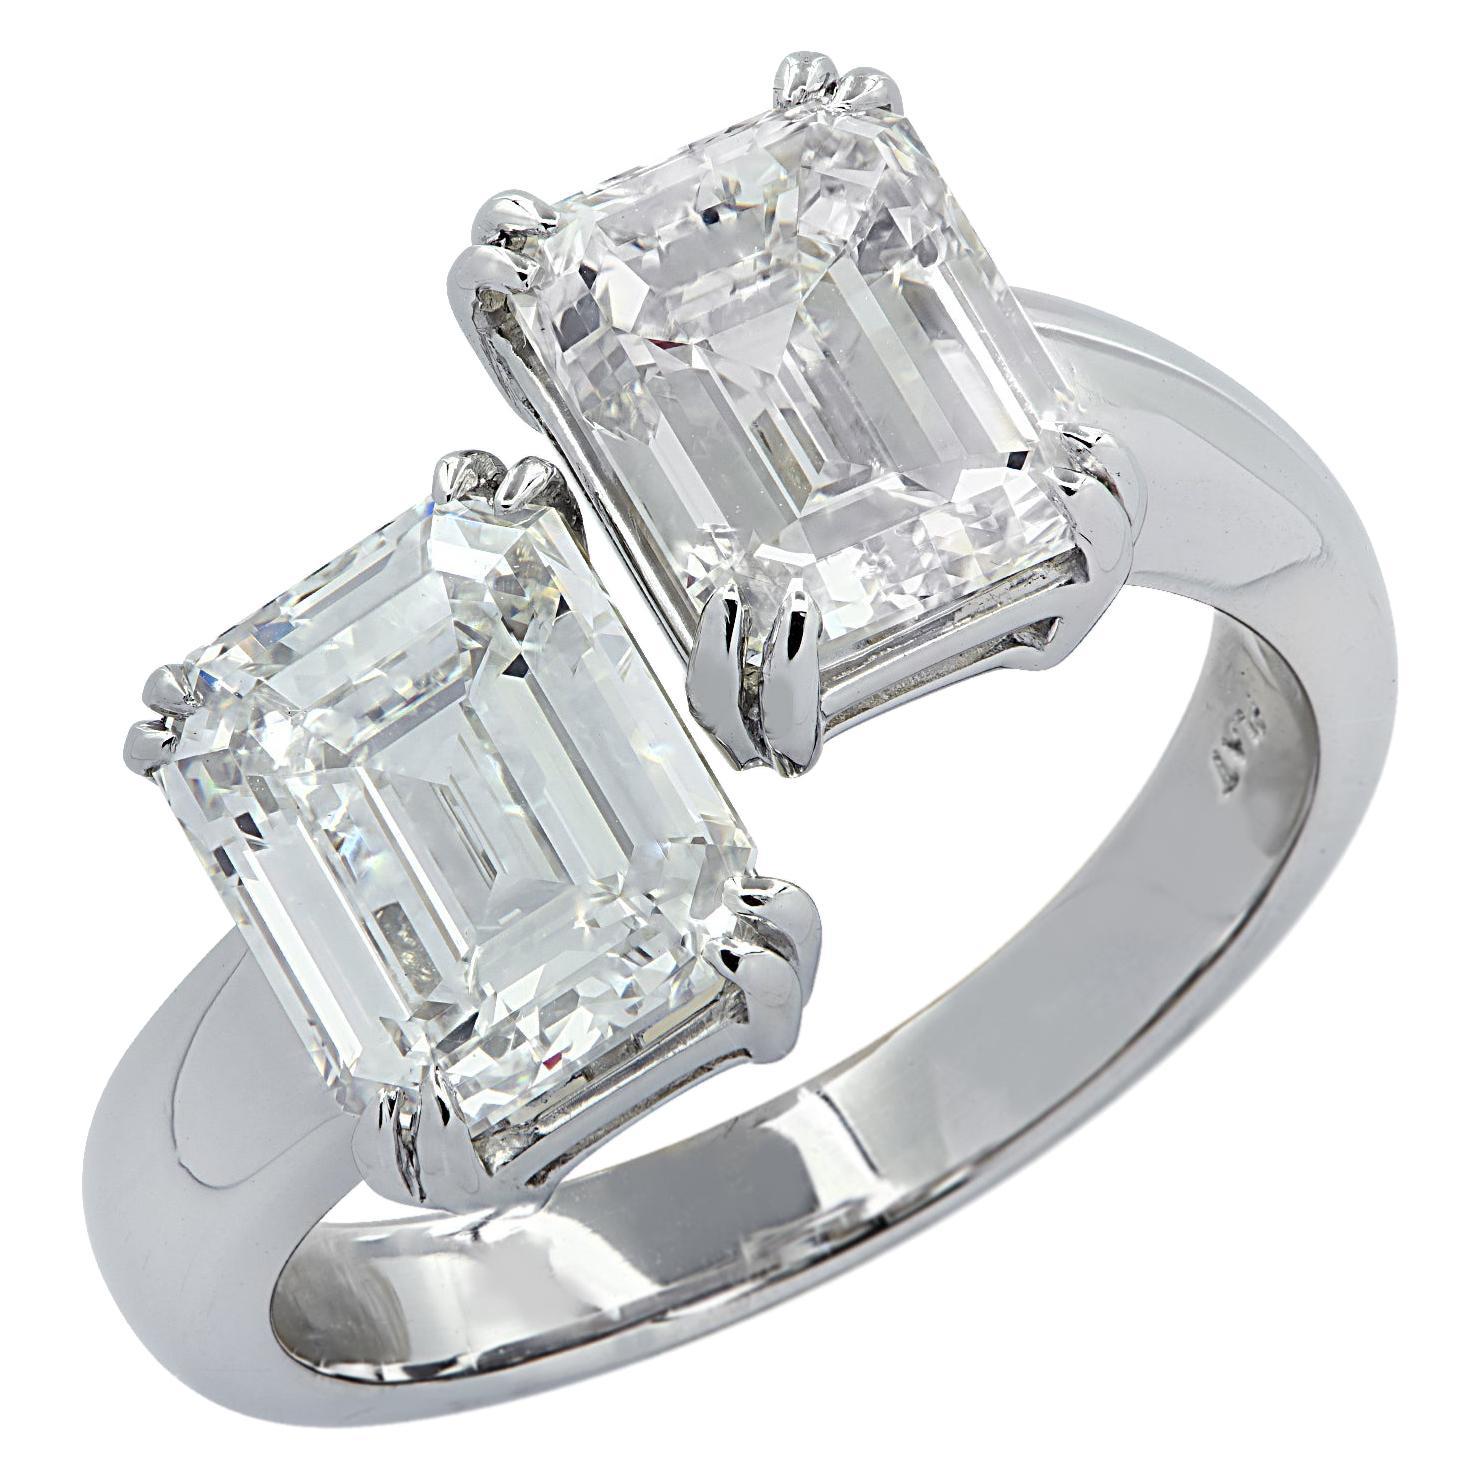 Vivid Diamonds 4.06 Carat Emerald Cut Diamond Moi Et Toi Ring